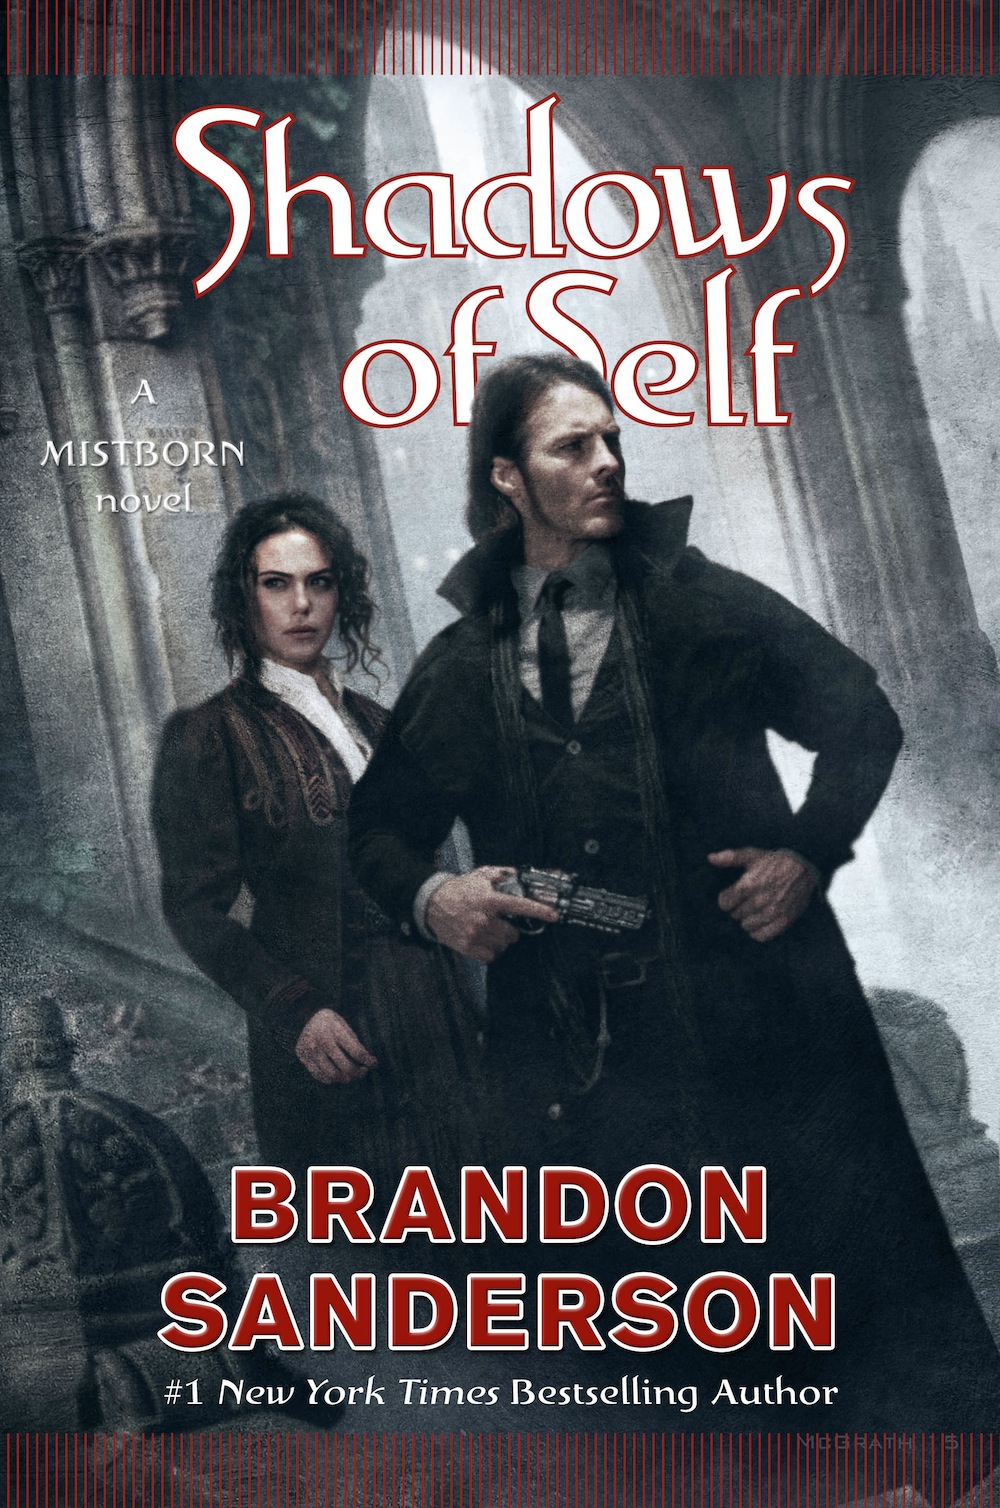 Shadows of Self cover reveal Brandon Sanderson